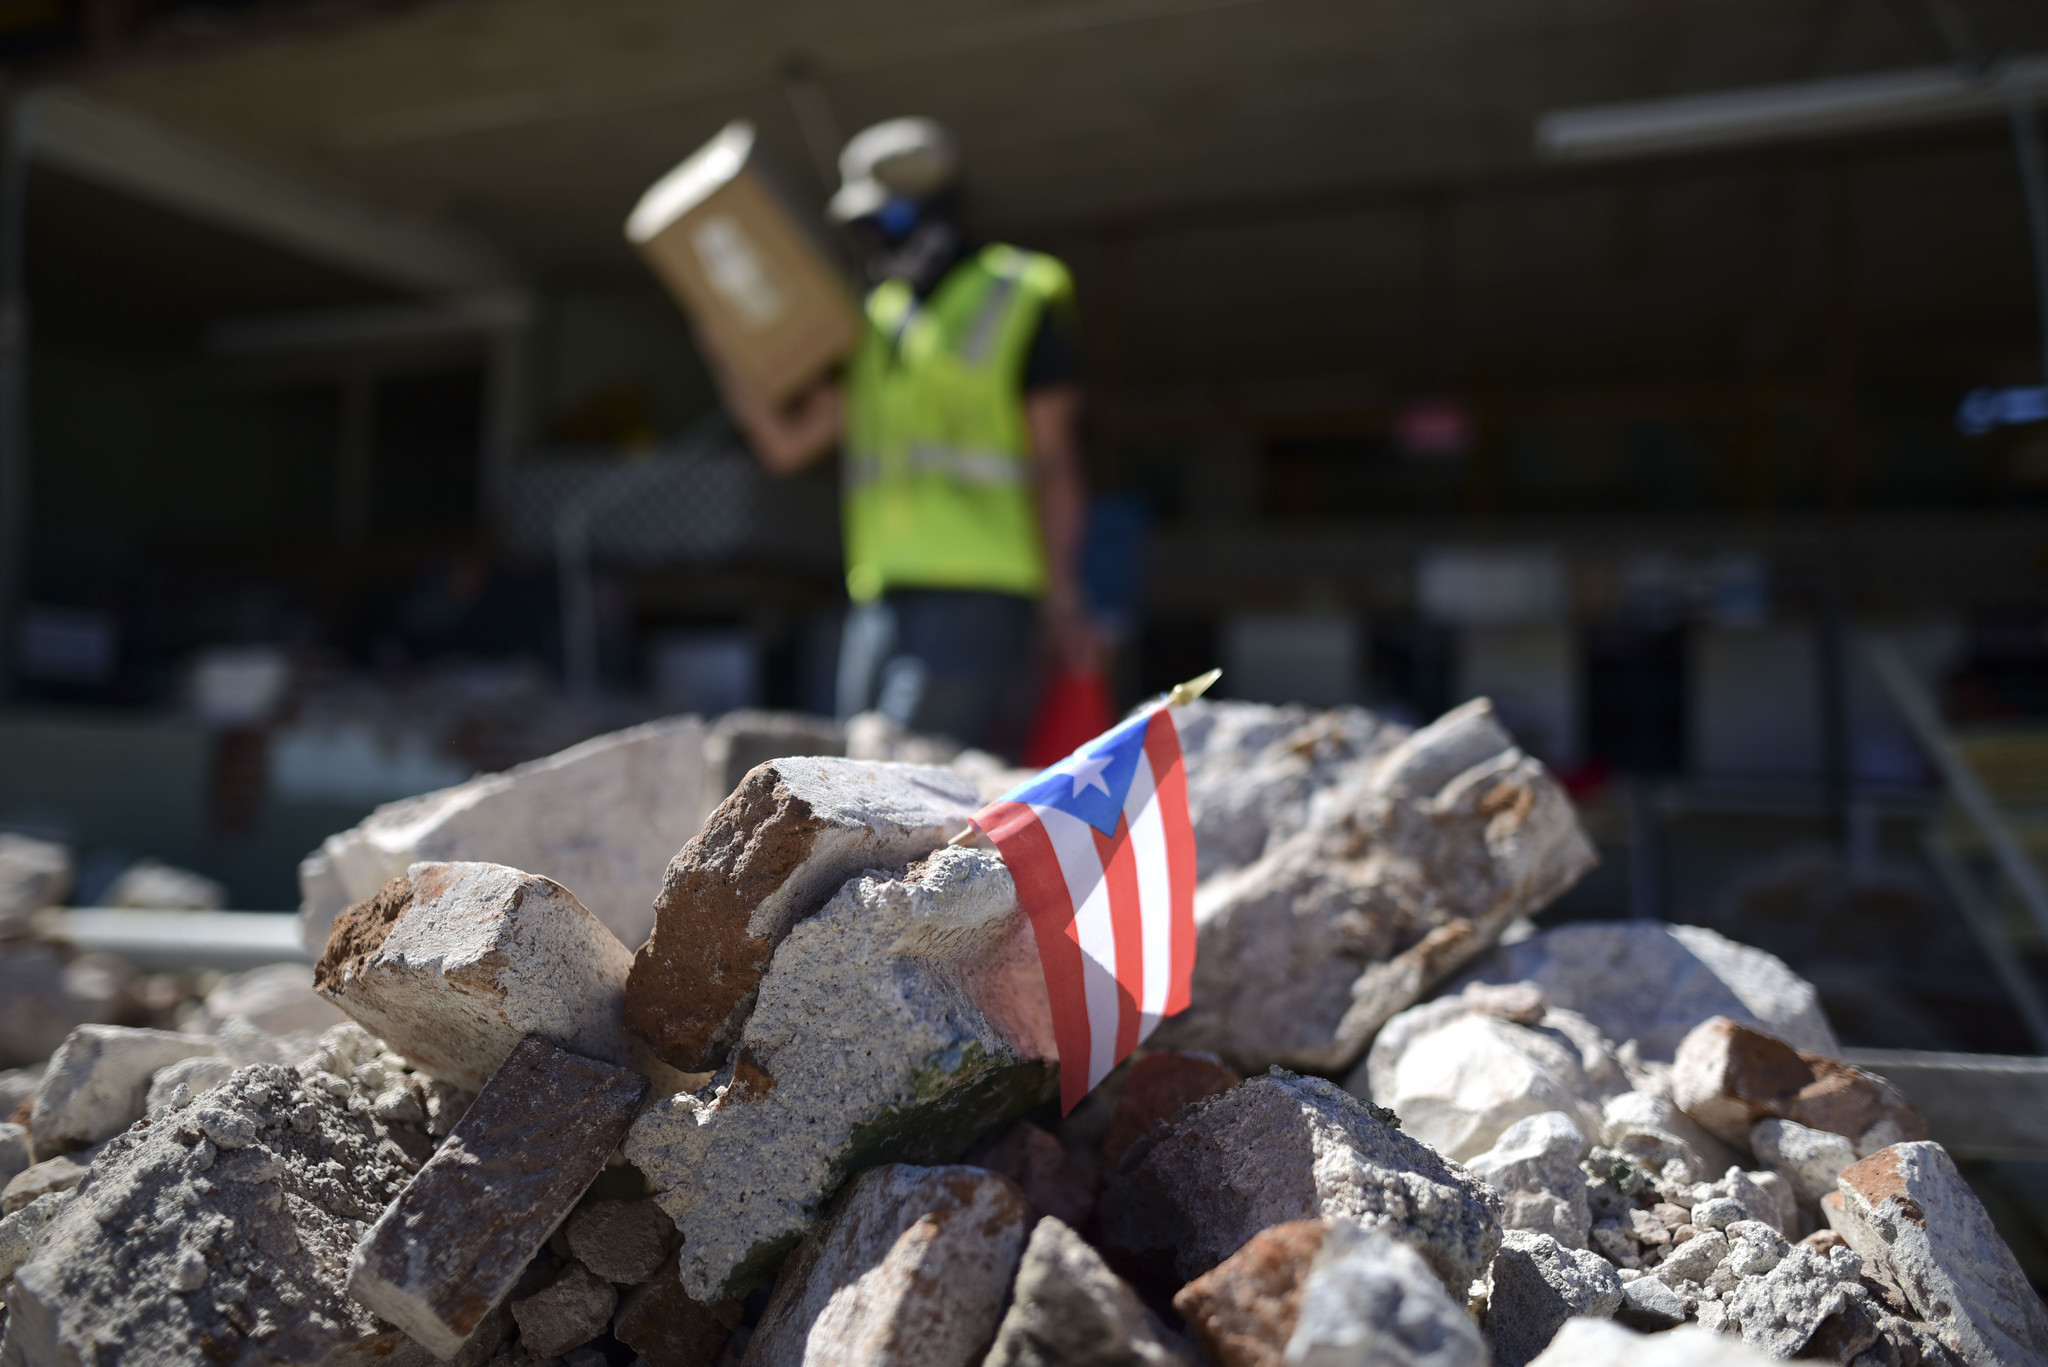 5.0-magnitude earthquake strikes off coast of Puerto Rico